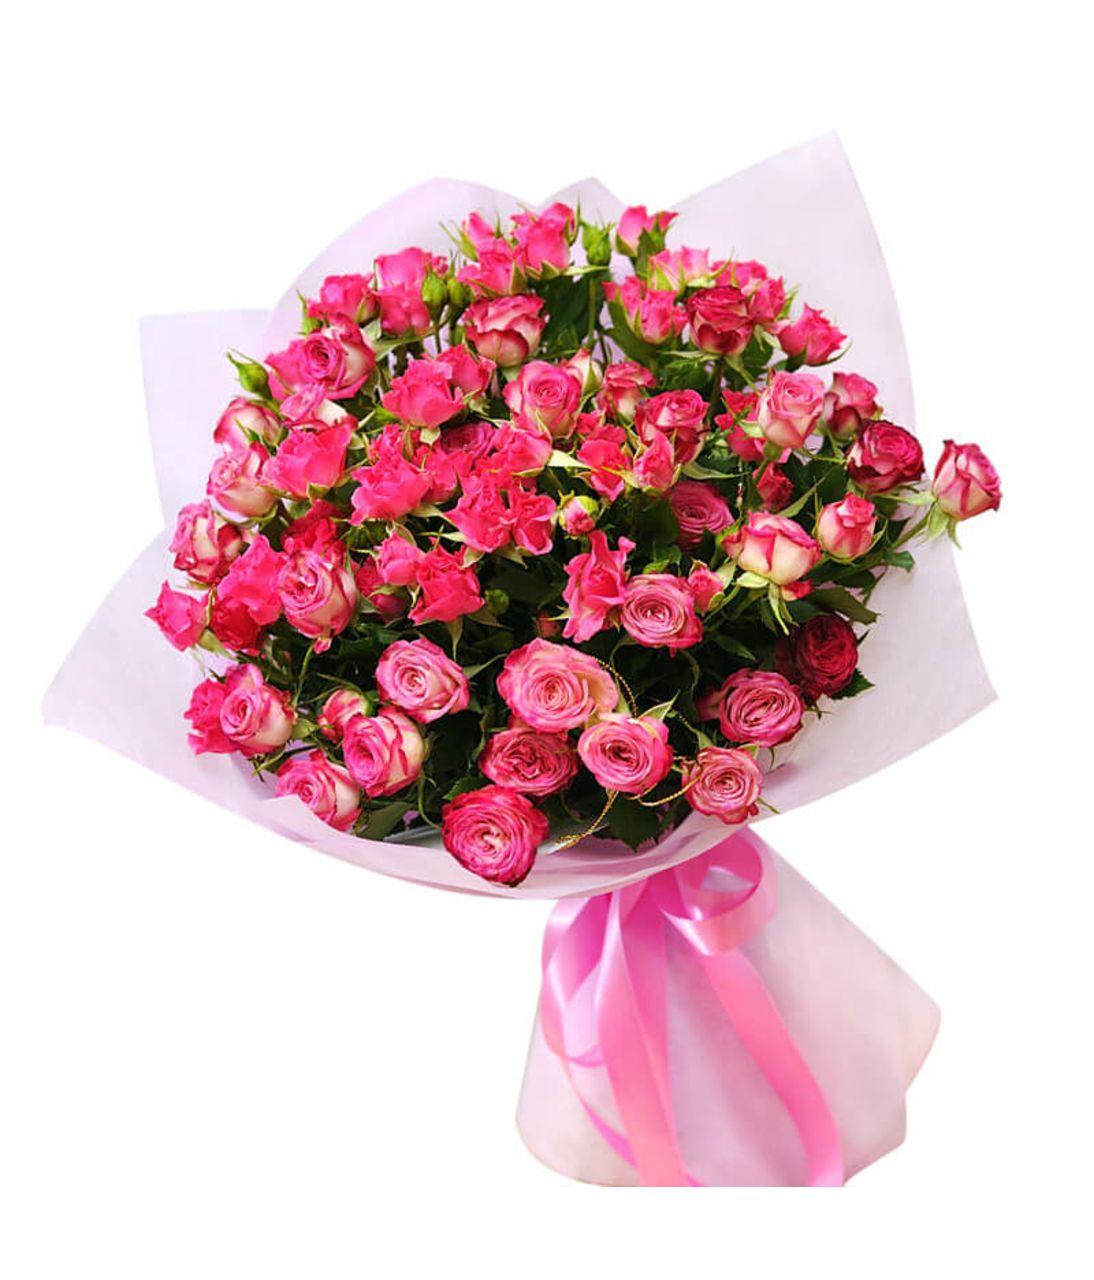 Букет рожевої кущової троянди. superflowers.com.ua